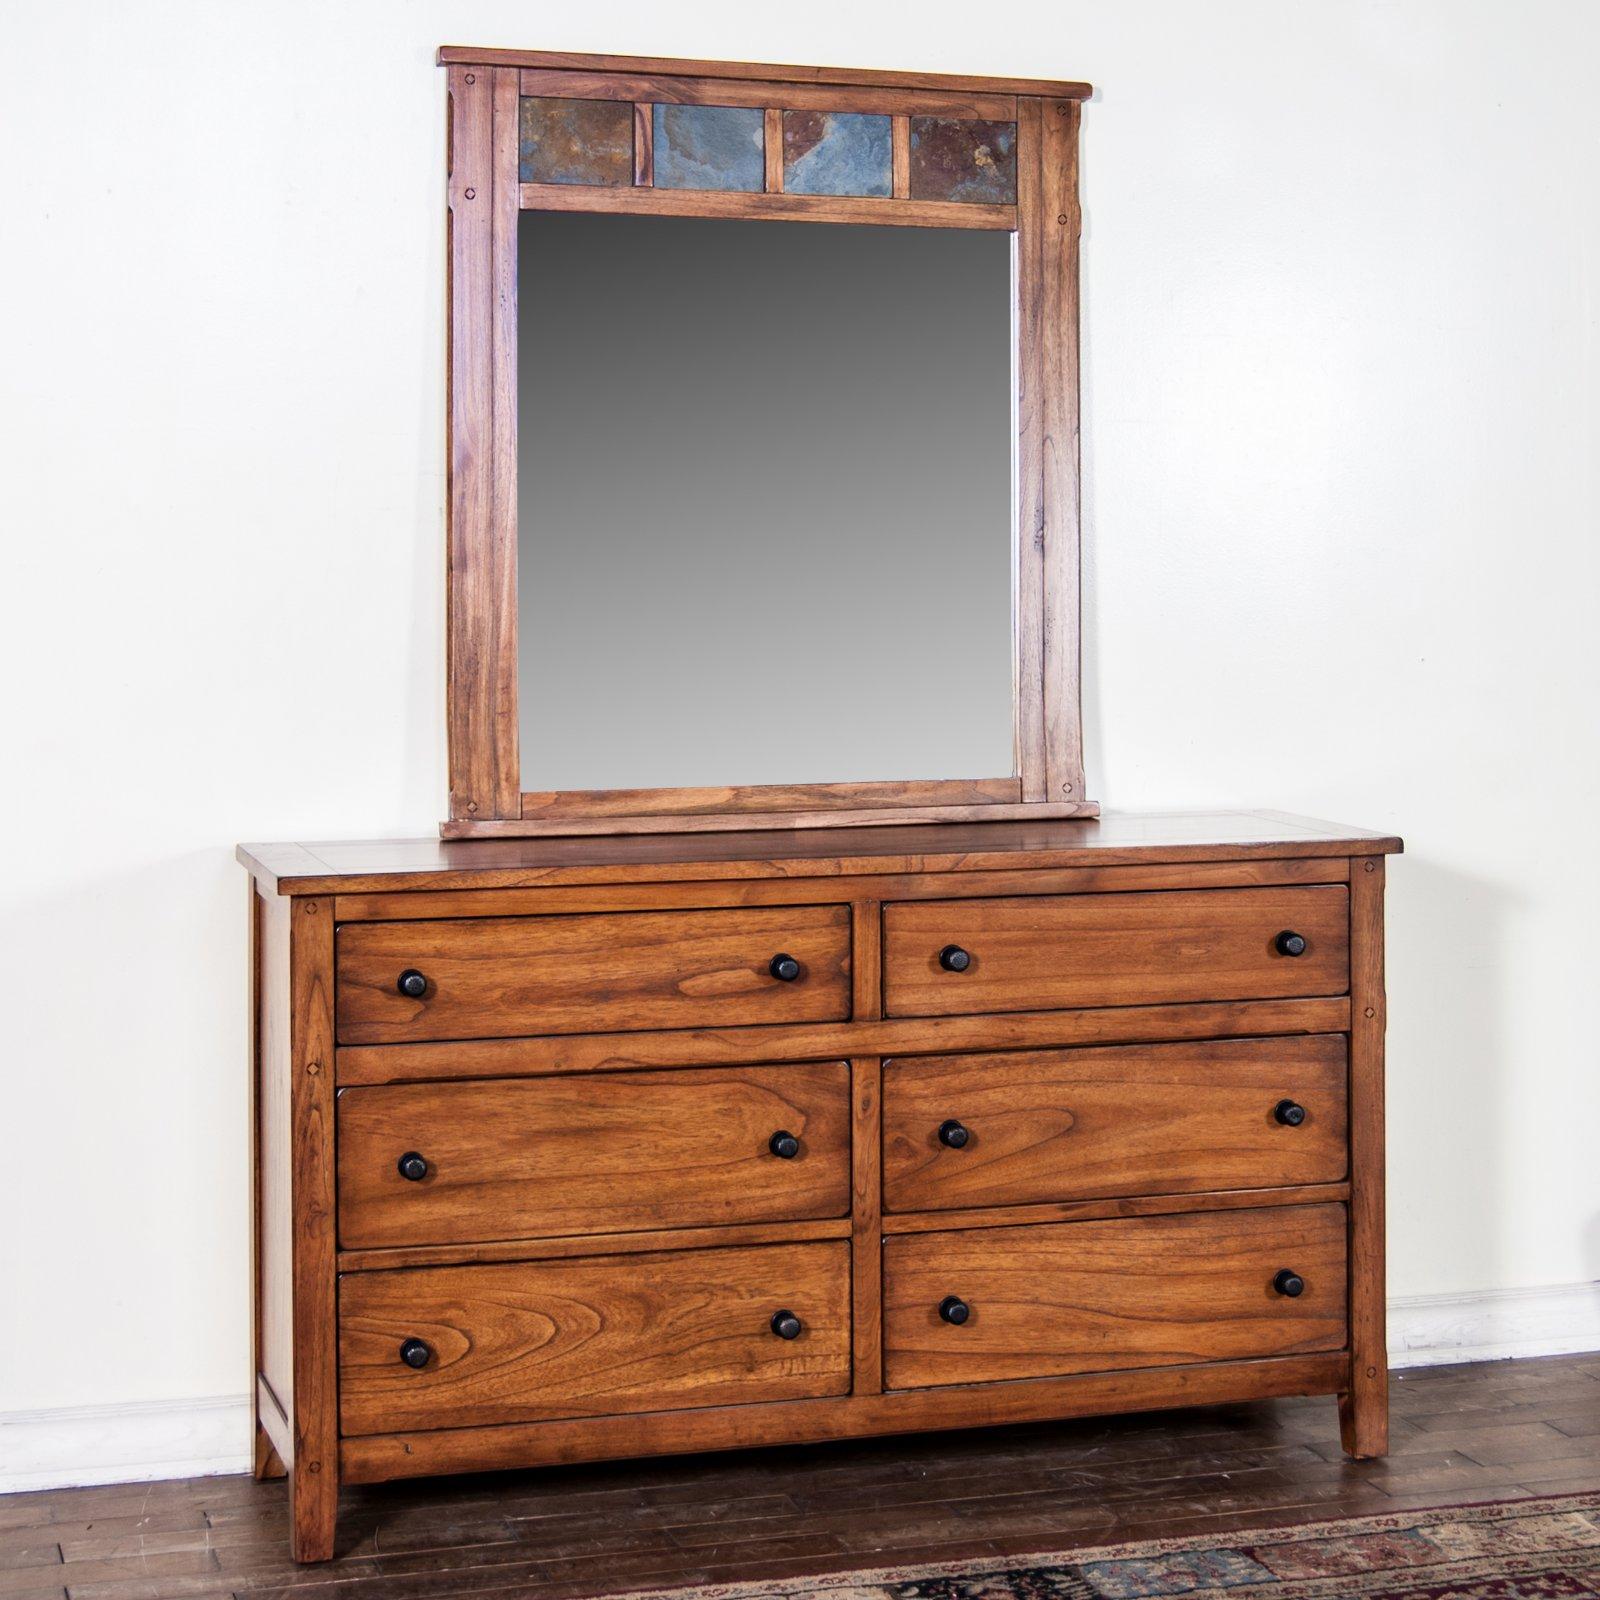 Sunny Designs Sedona 6 Drawer Dresser